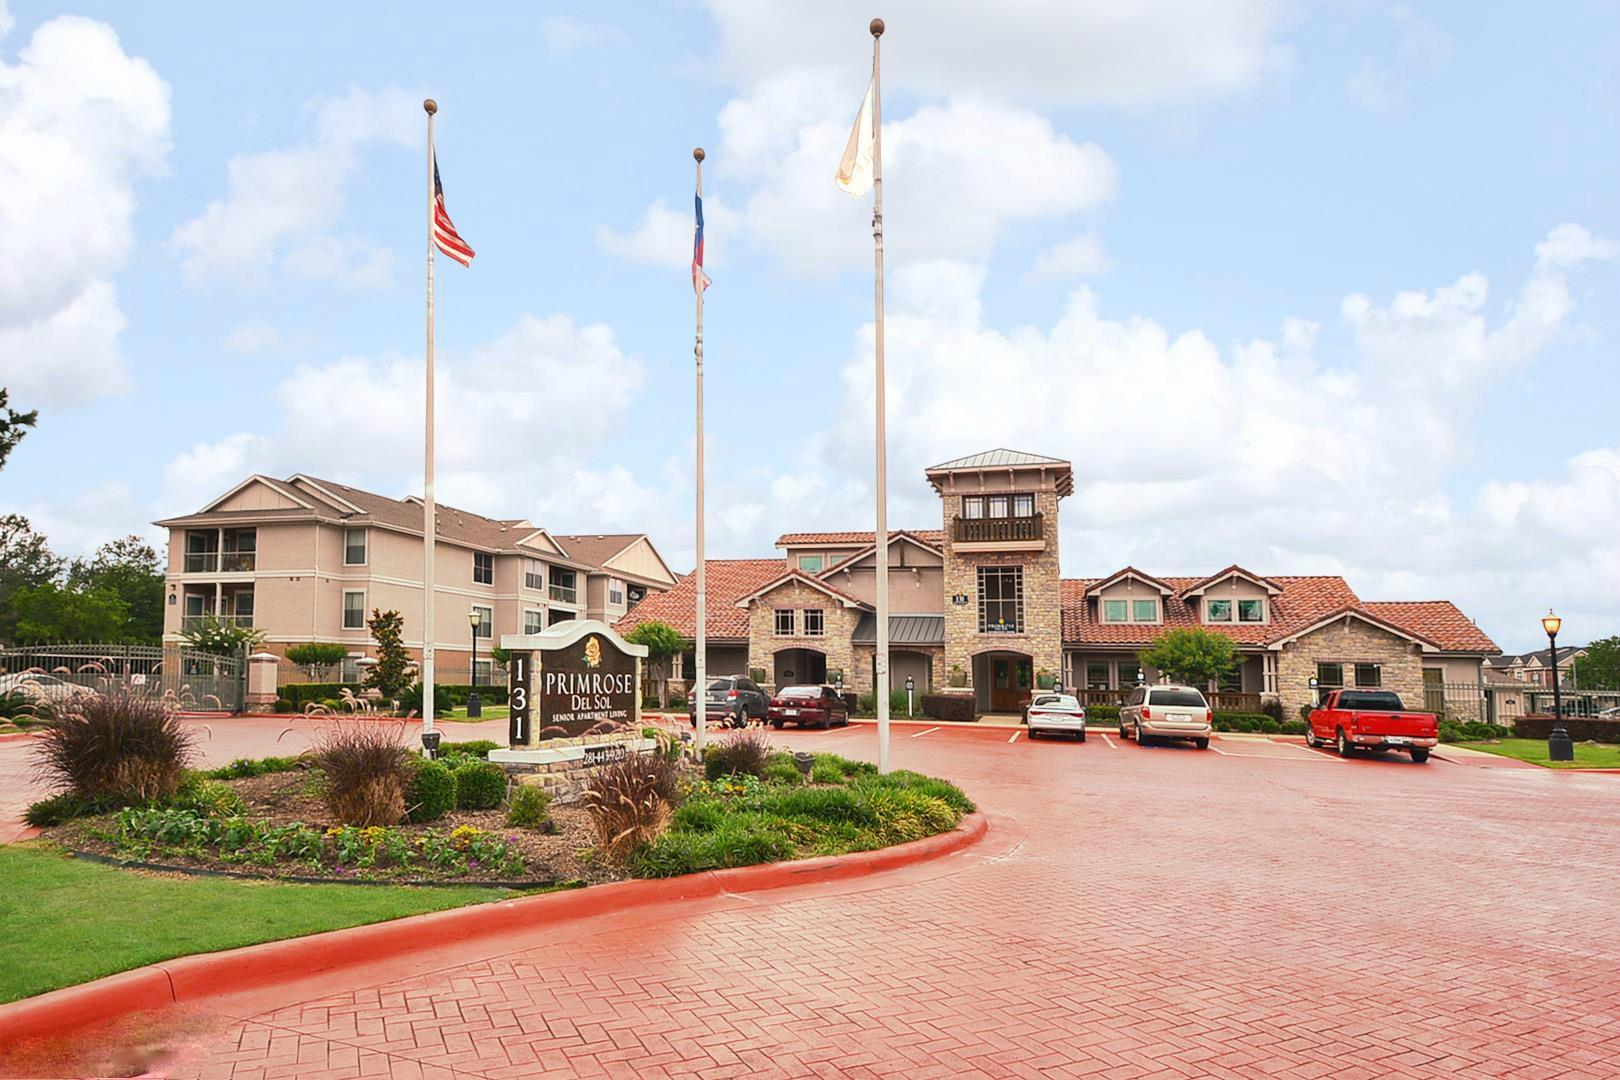 Primrose Del Sol - Active Senior Living Apartments photo #1